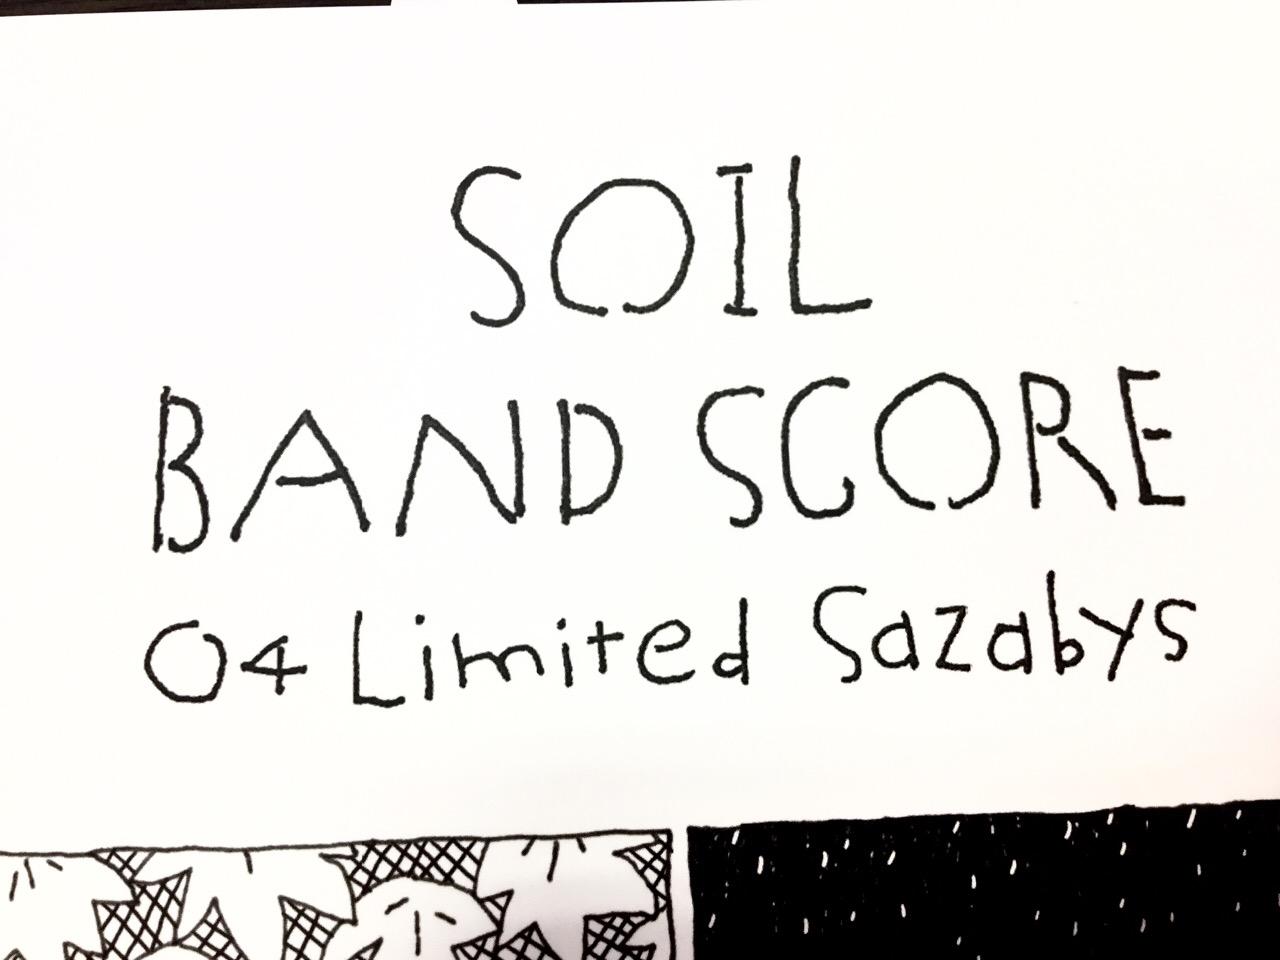 04 Limited Sazabys Cavu バンドスコアが発売 04 Limited Sazabys関連バンドスコア取り扱い中 八王子店 店舗情報 島村楽器